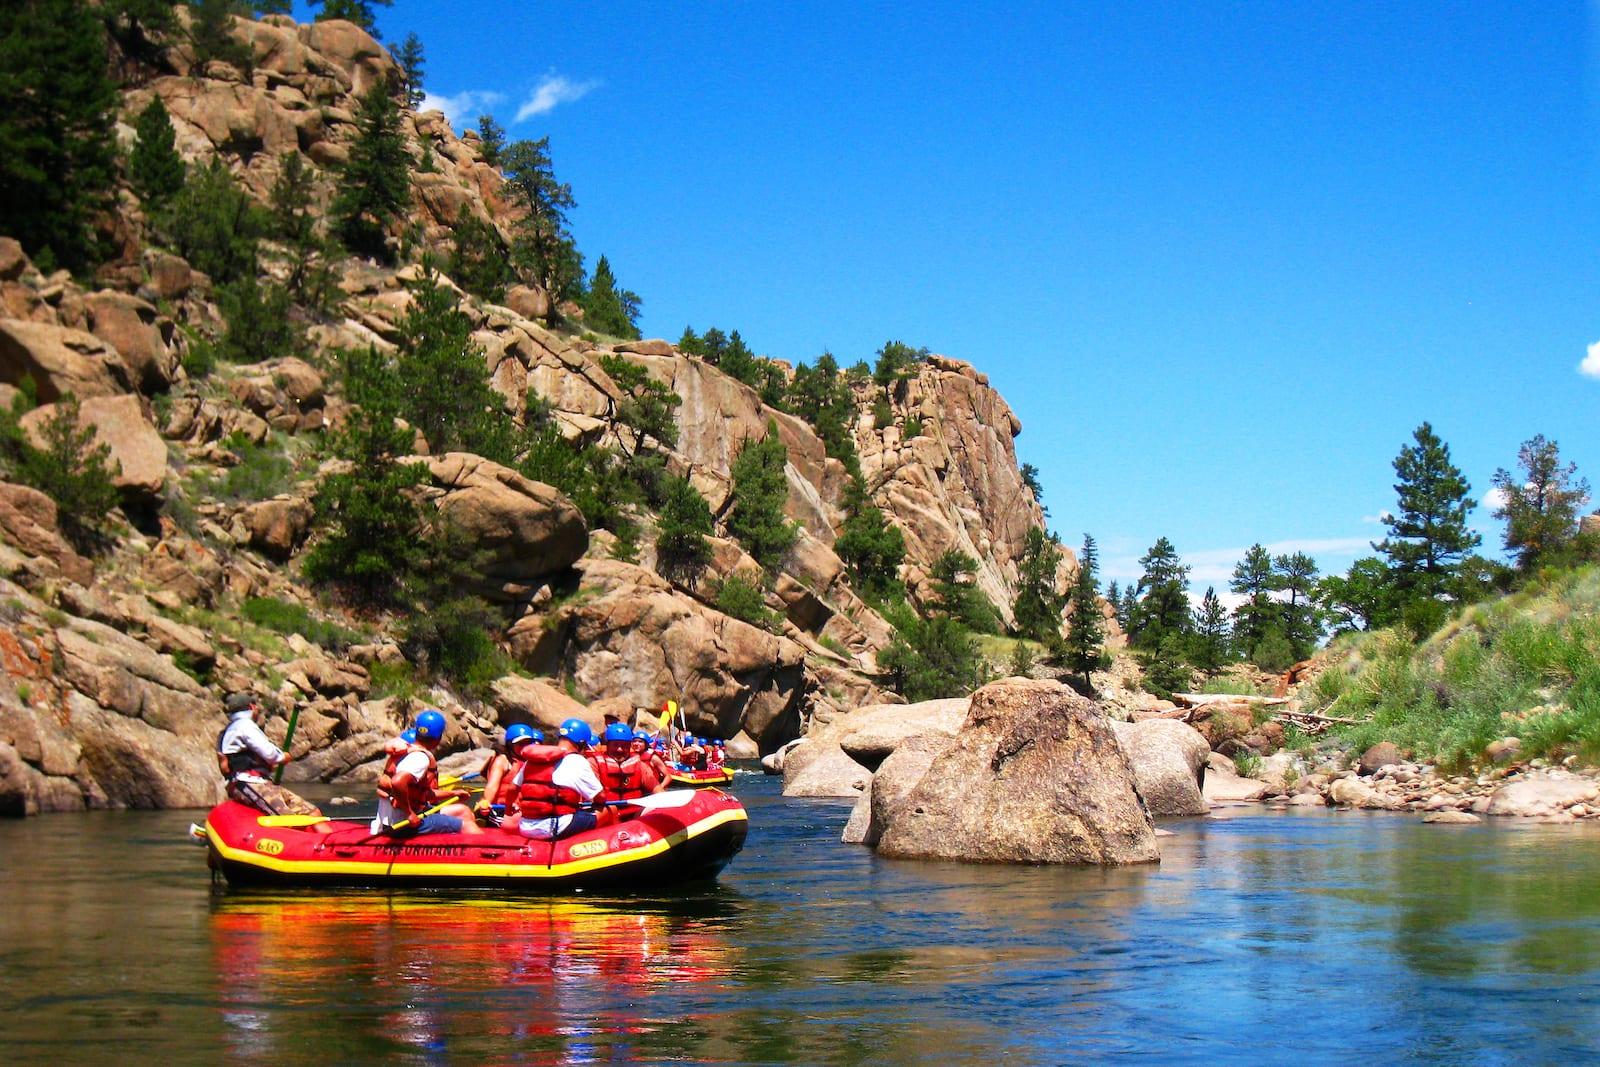 Rafts on Arkansas River, CO